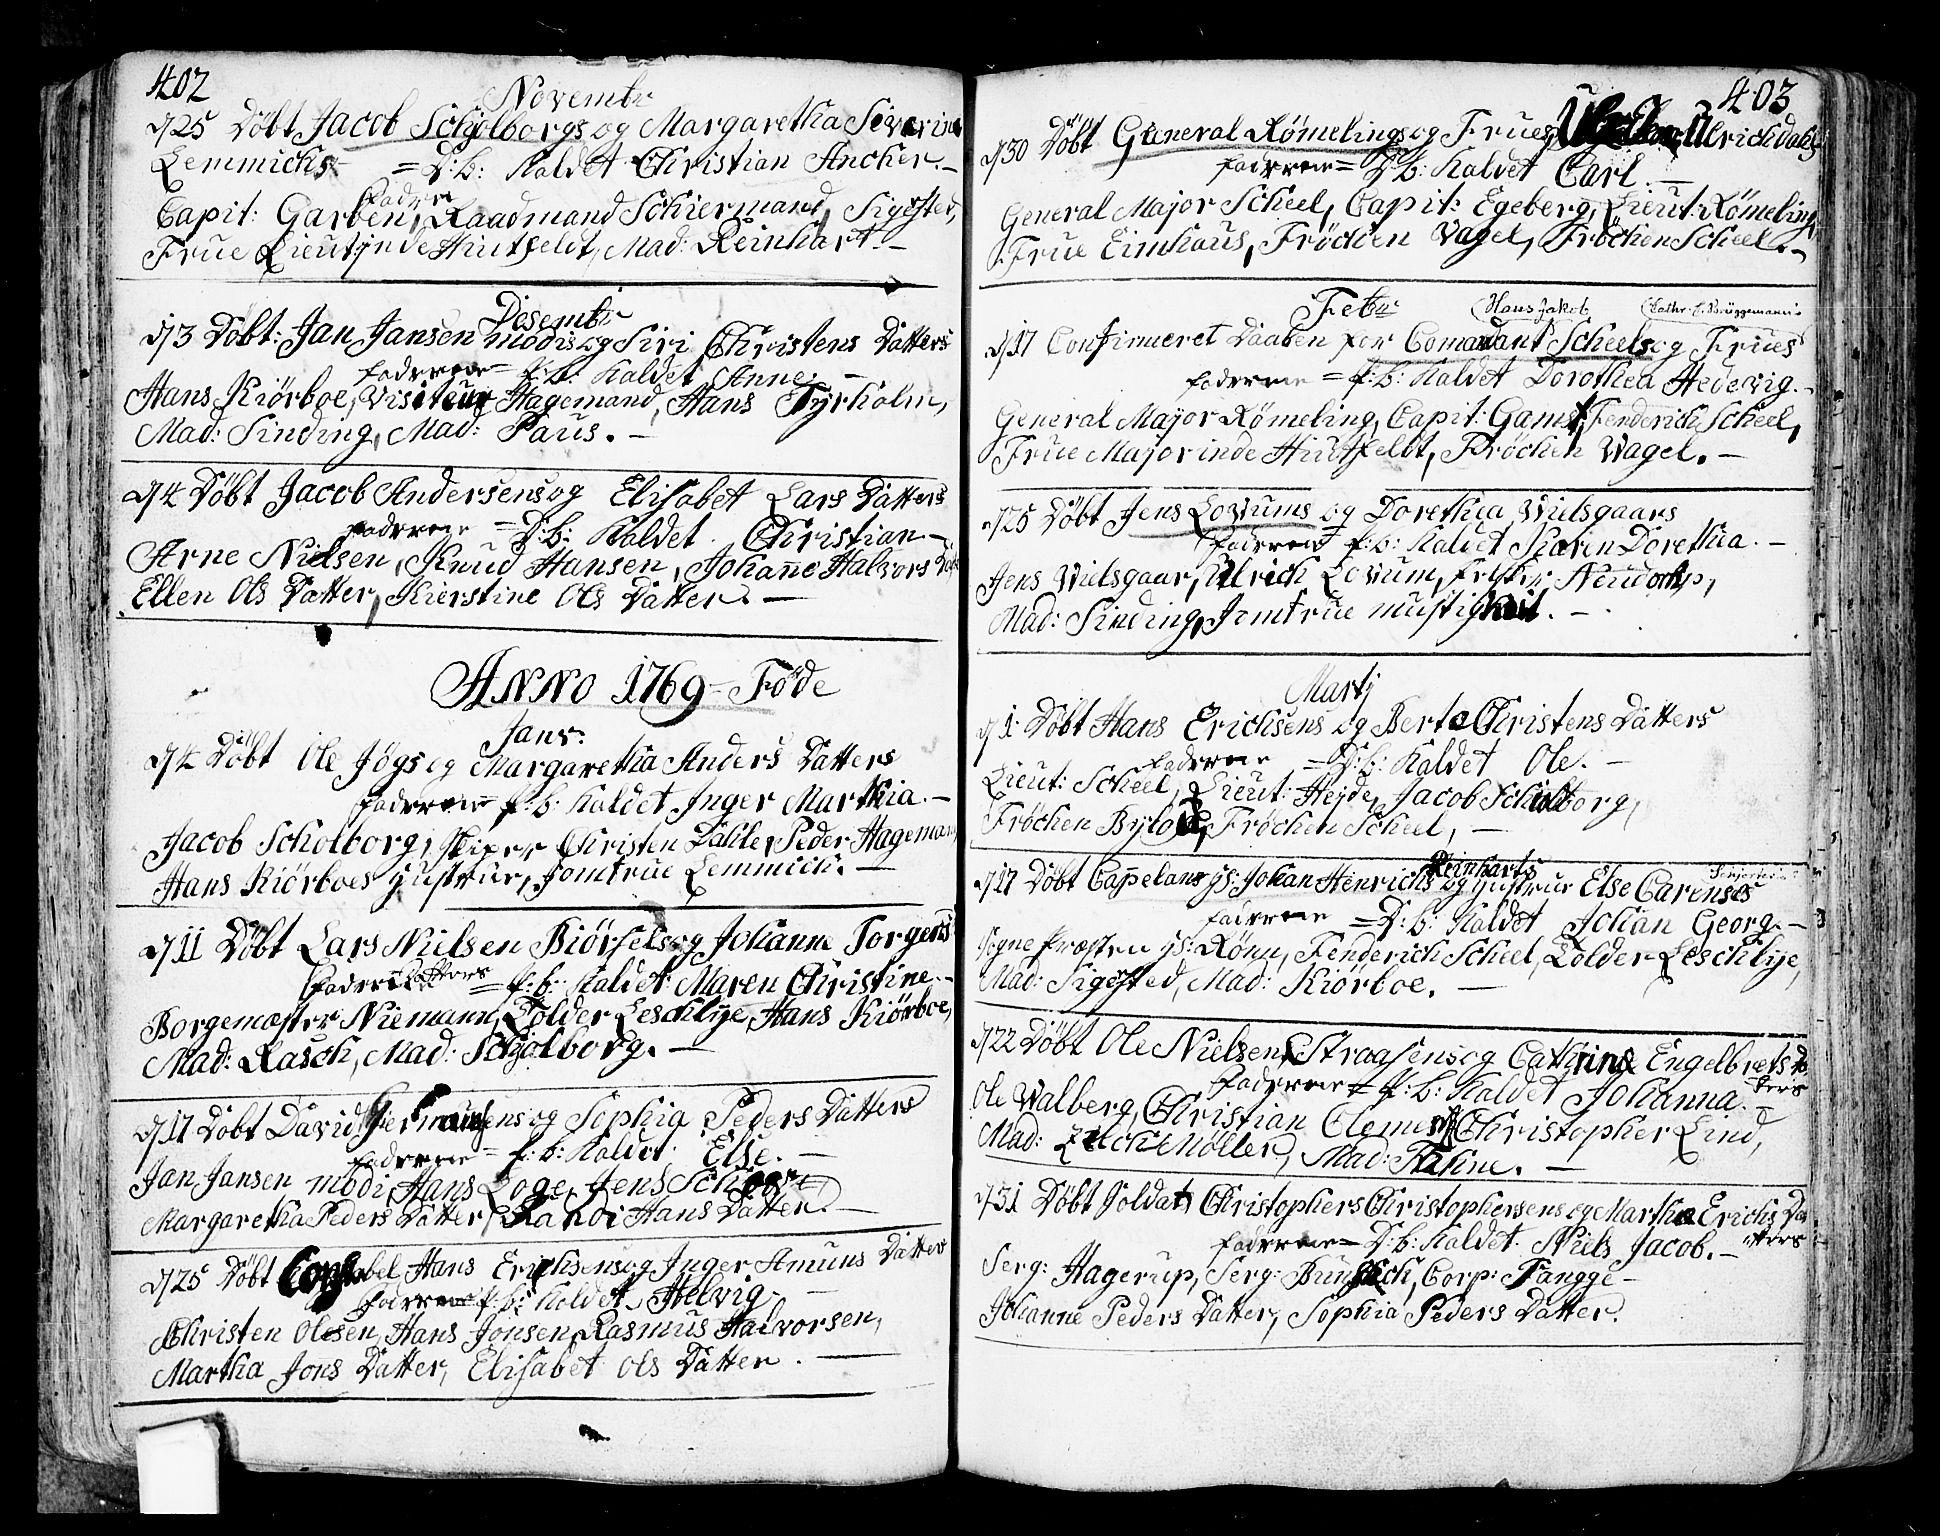 SAO, Fredrikstad prestekontor Kirkebøker, F/Fa/L0002: Ministerialbok nr. 2, 1750-1804, s. 402-403